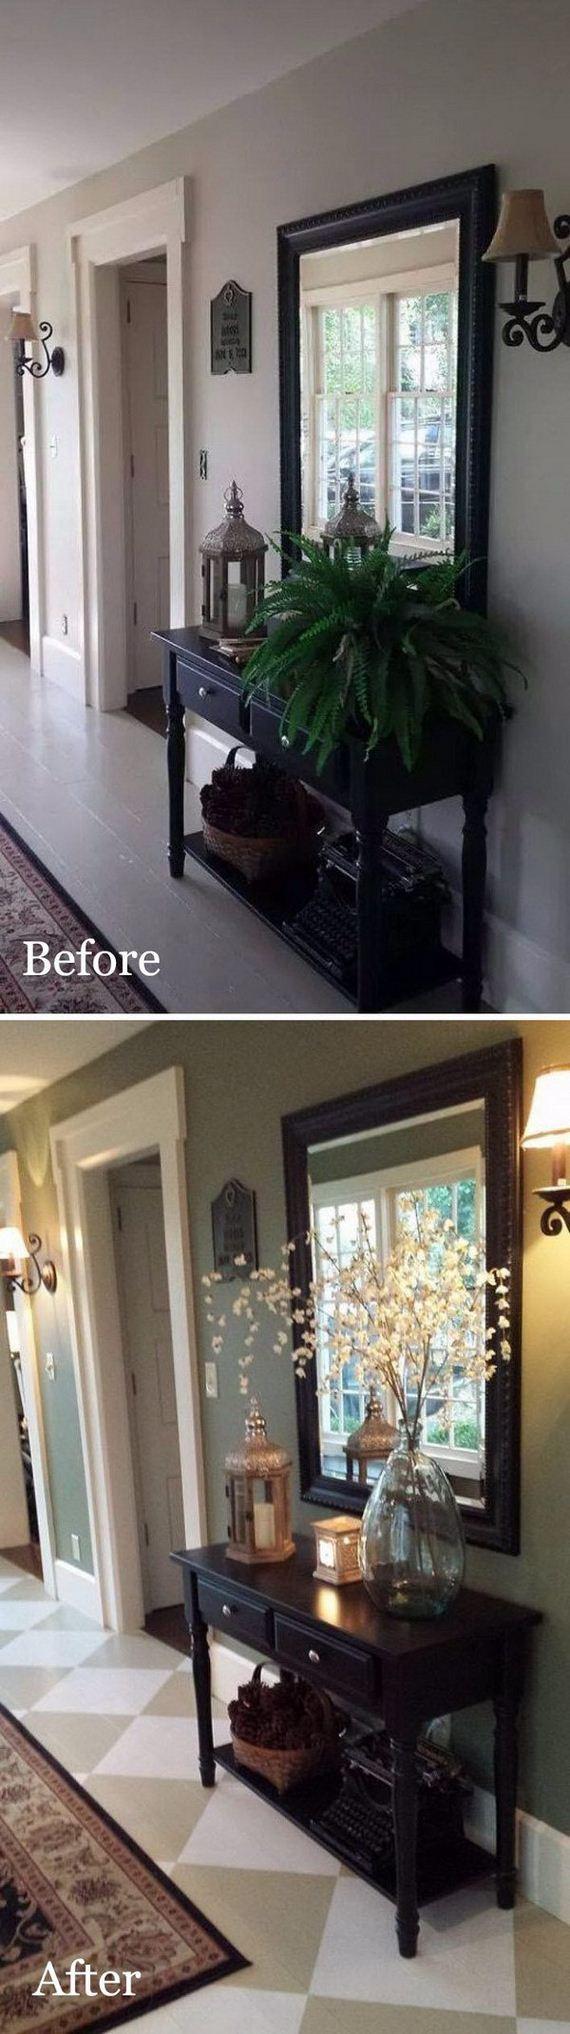 28-amazing-entryway-makeover